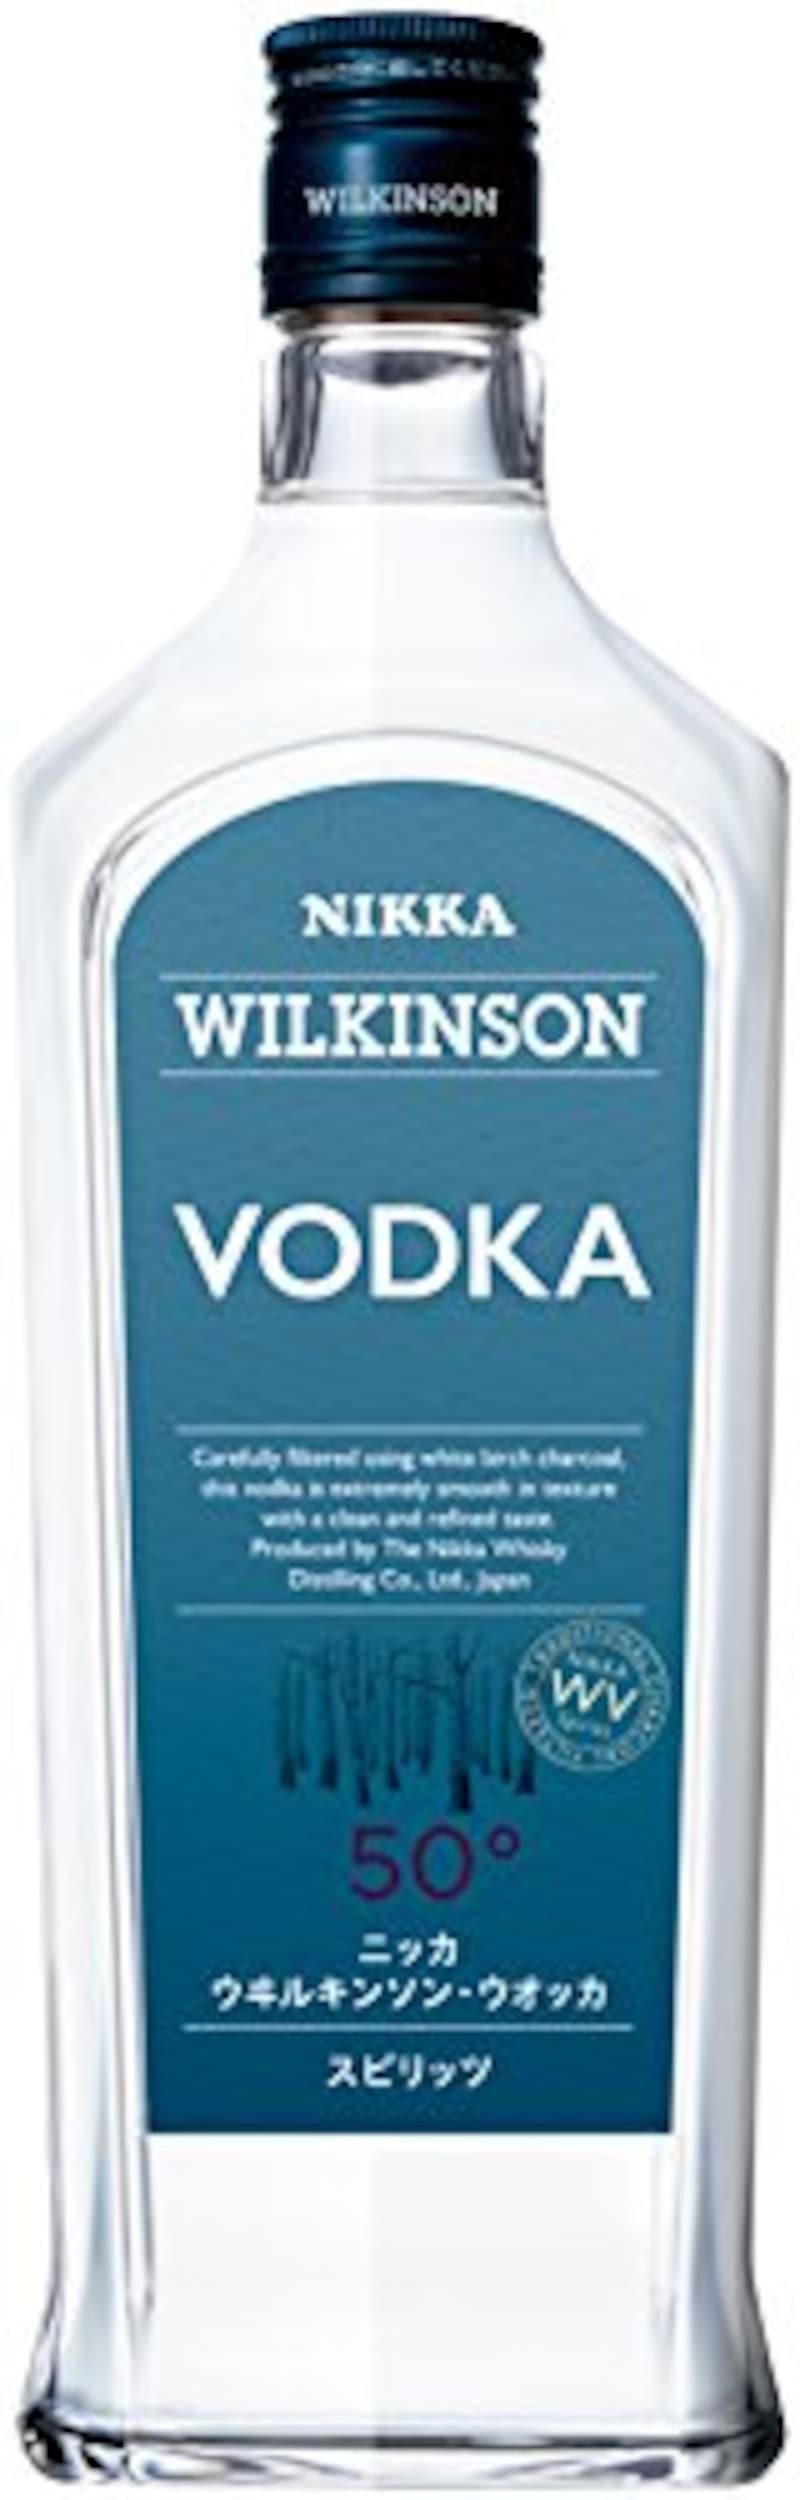 ウィルキンソン,ウィルキンソン ウオッカ50°,-